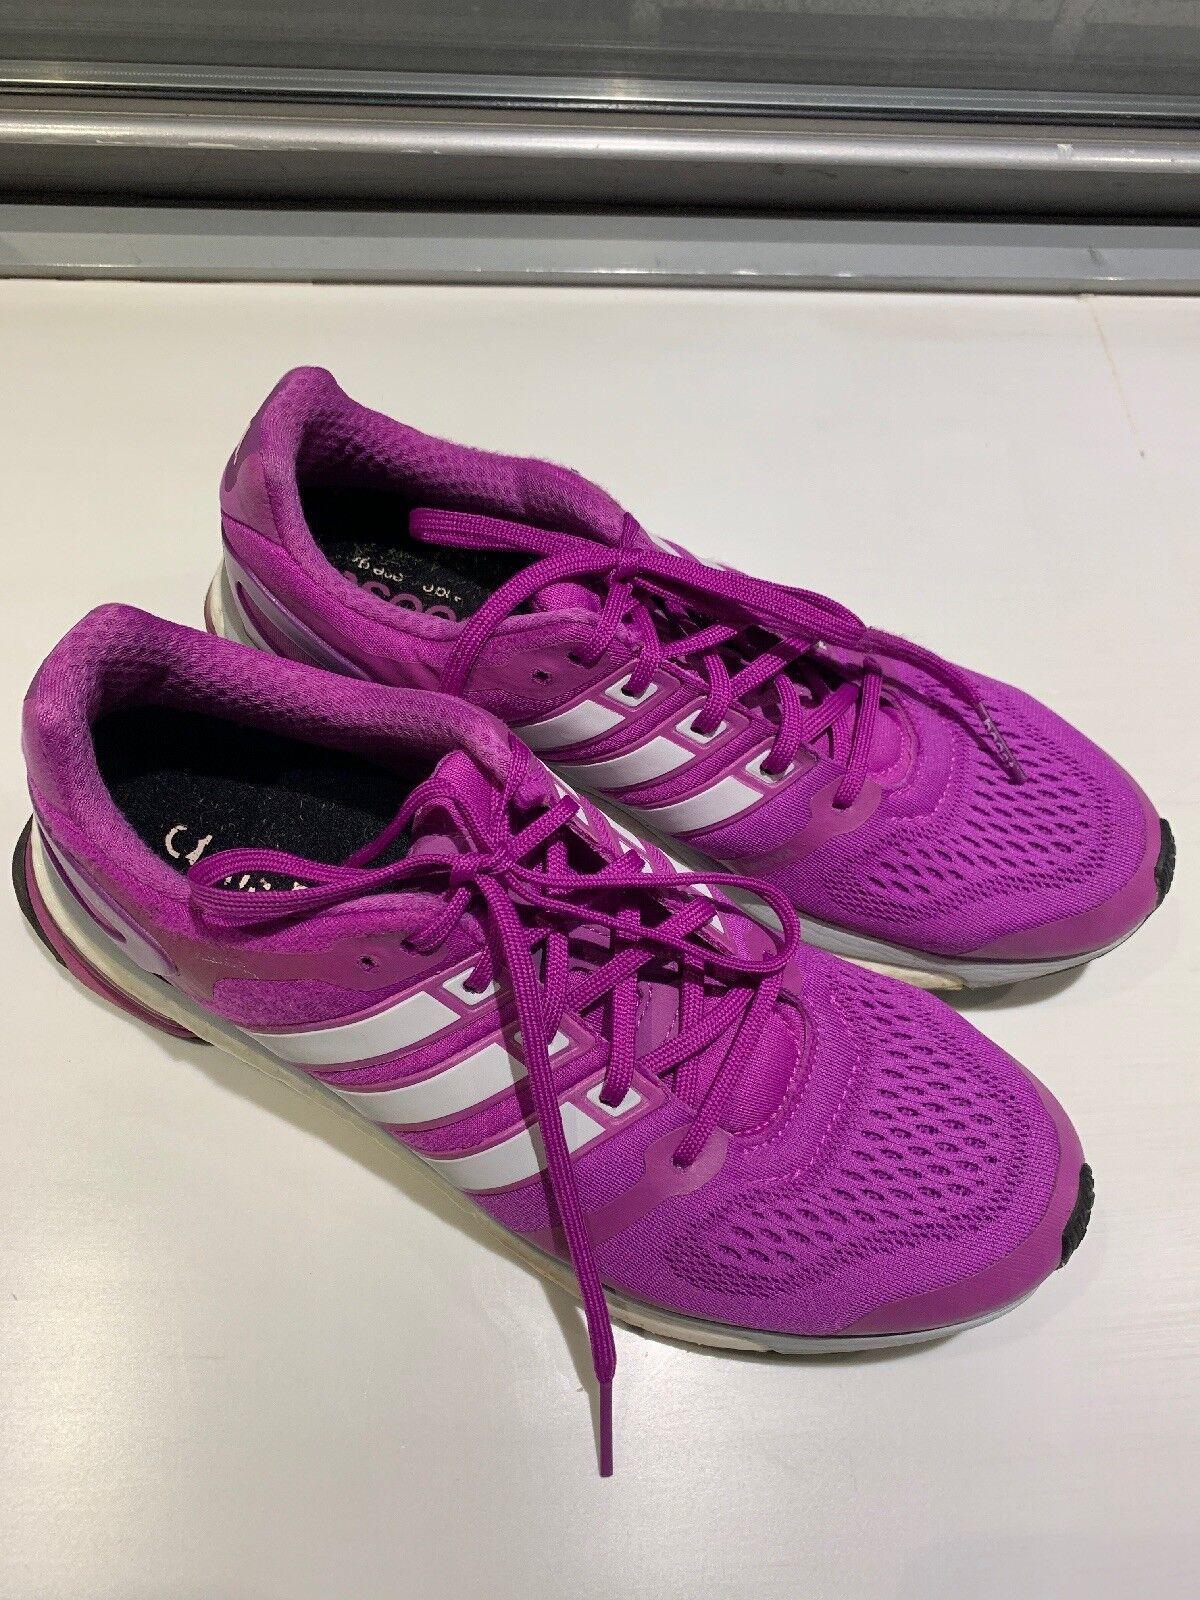 Women's Adidas Adistar Boost In Purple, Size US 10